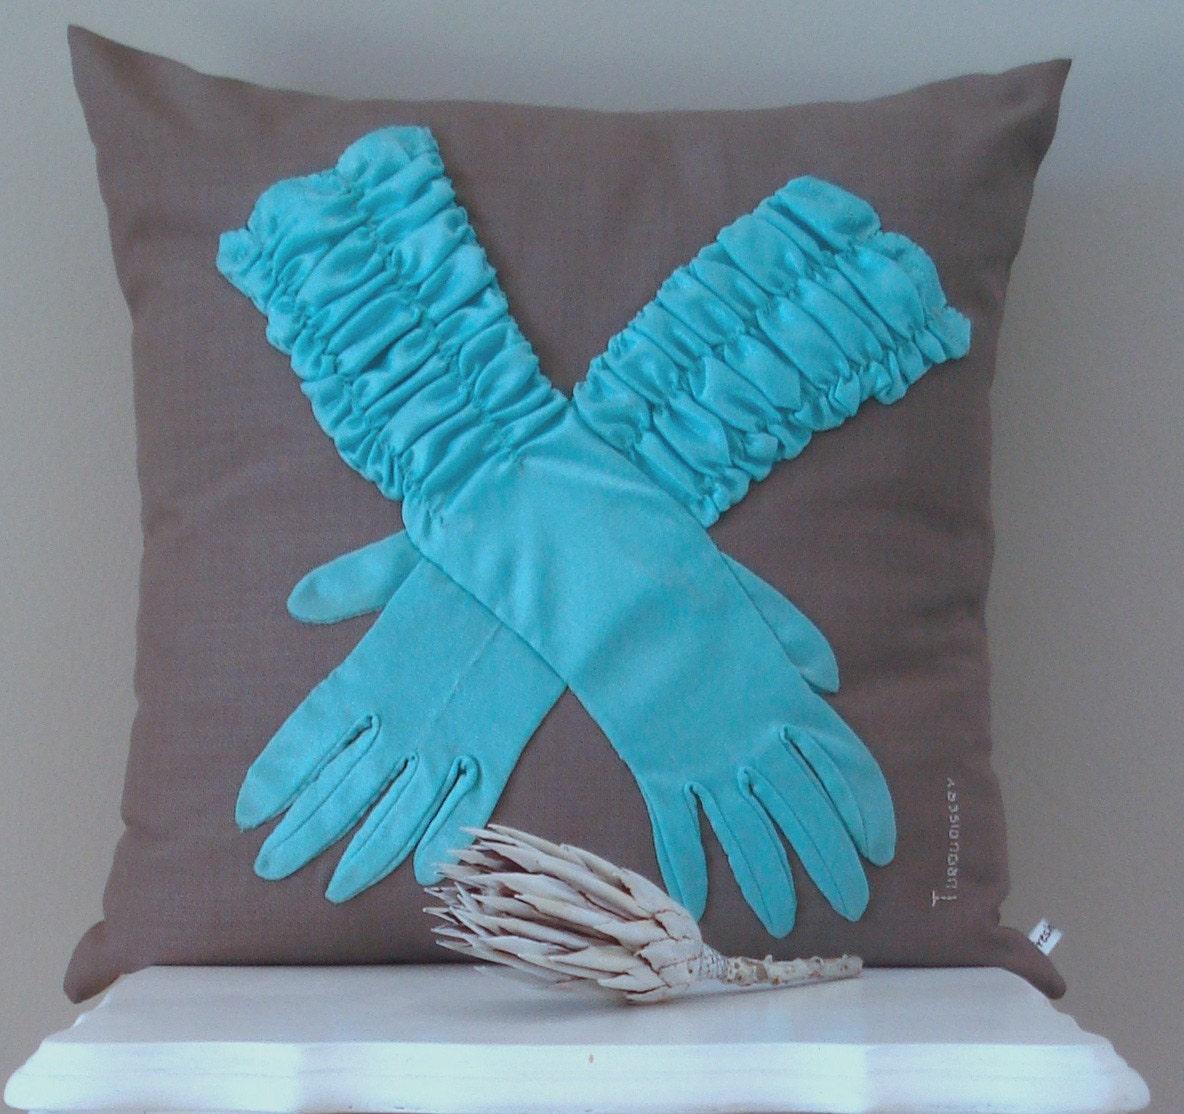 Glove Cushion Cover - Turquoisery